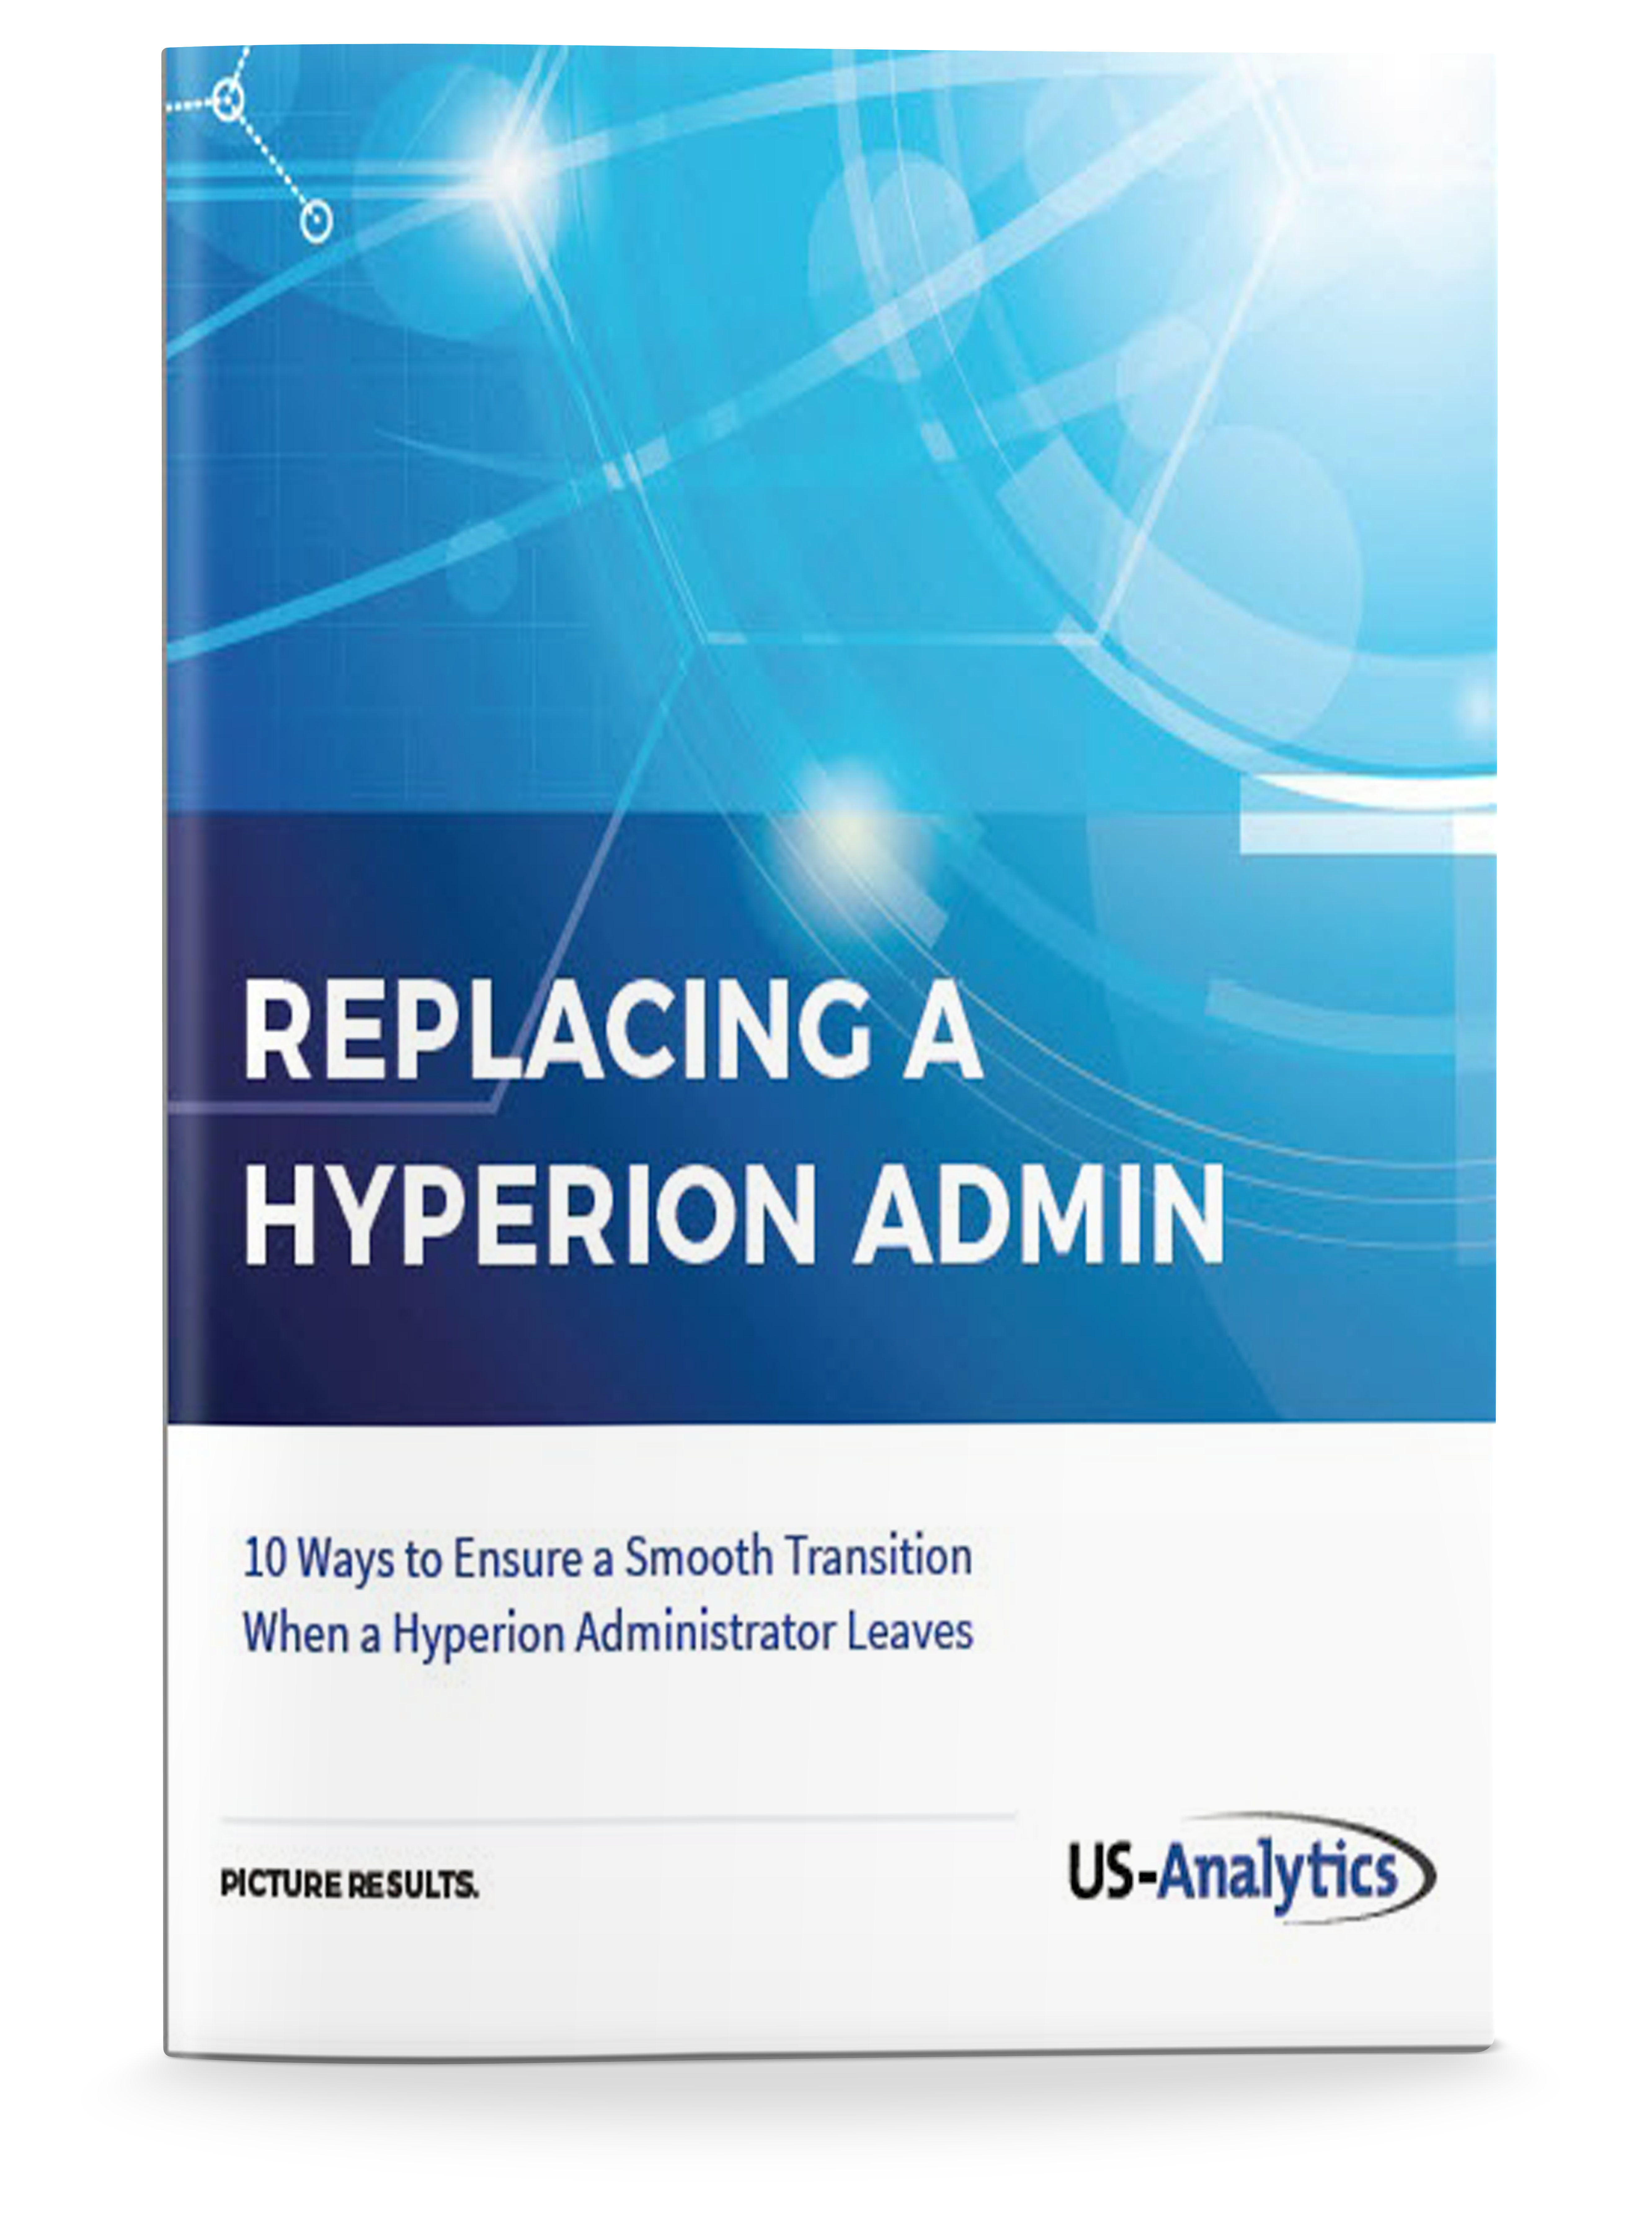 replacing hyperion admin cta.png